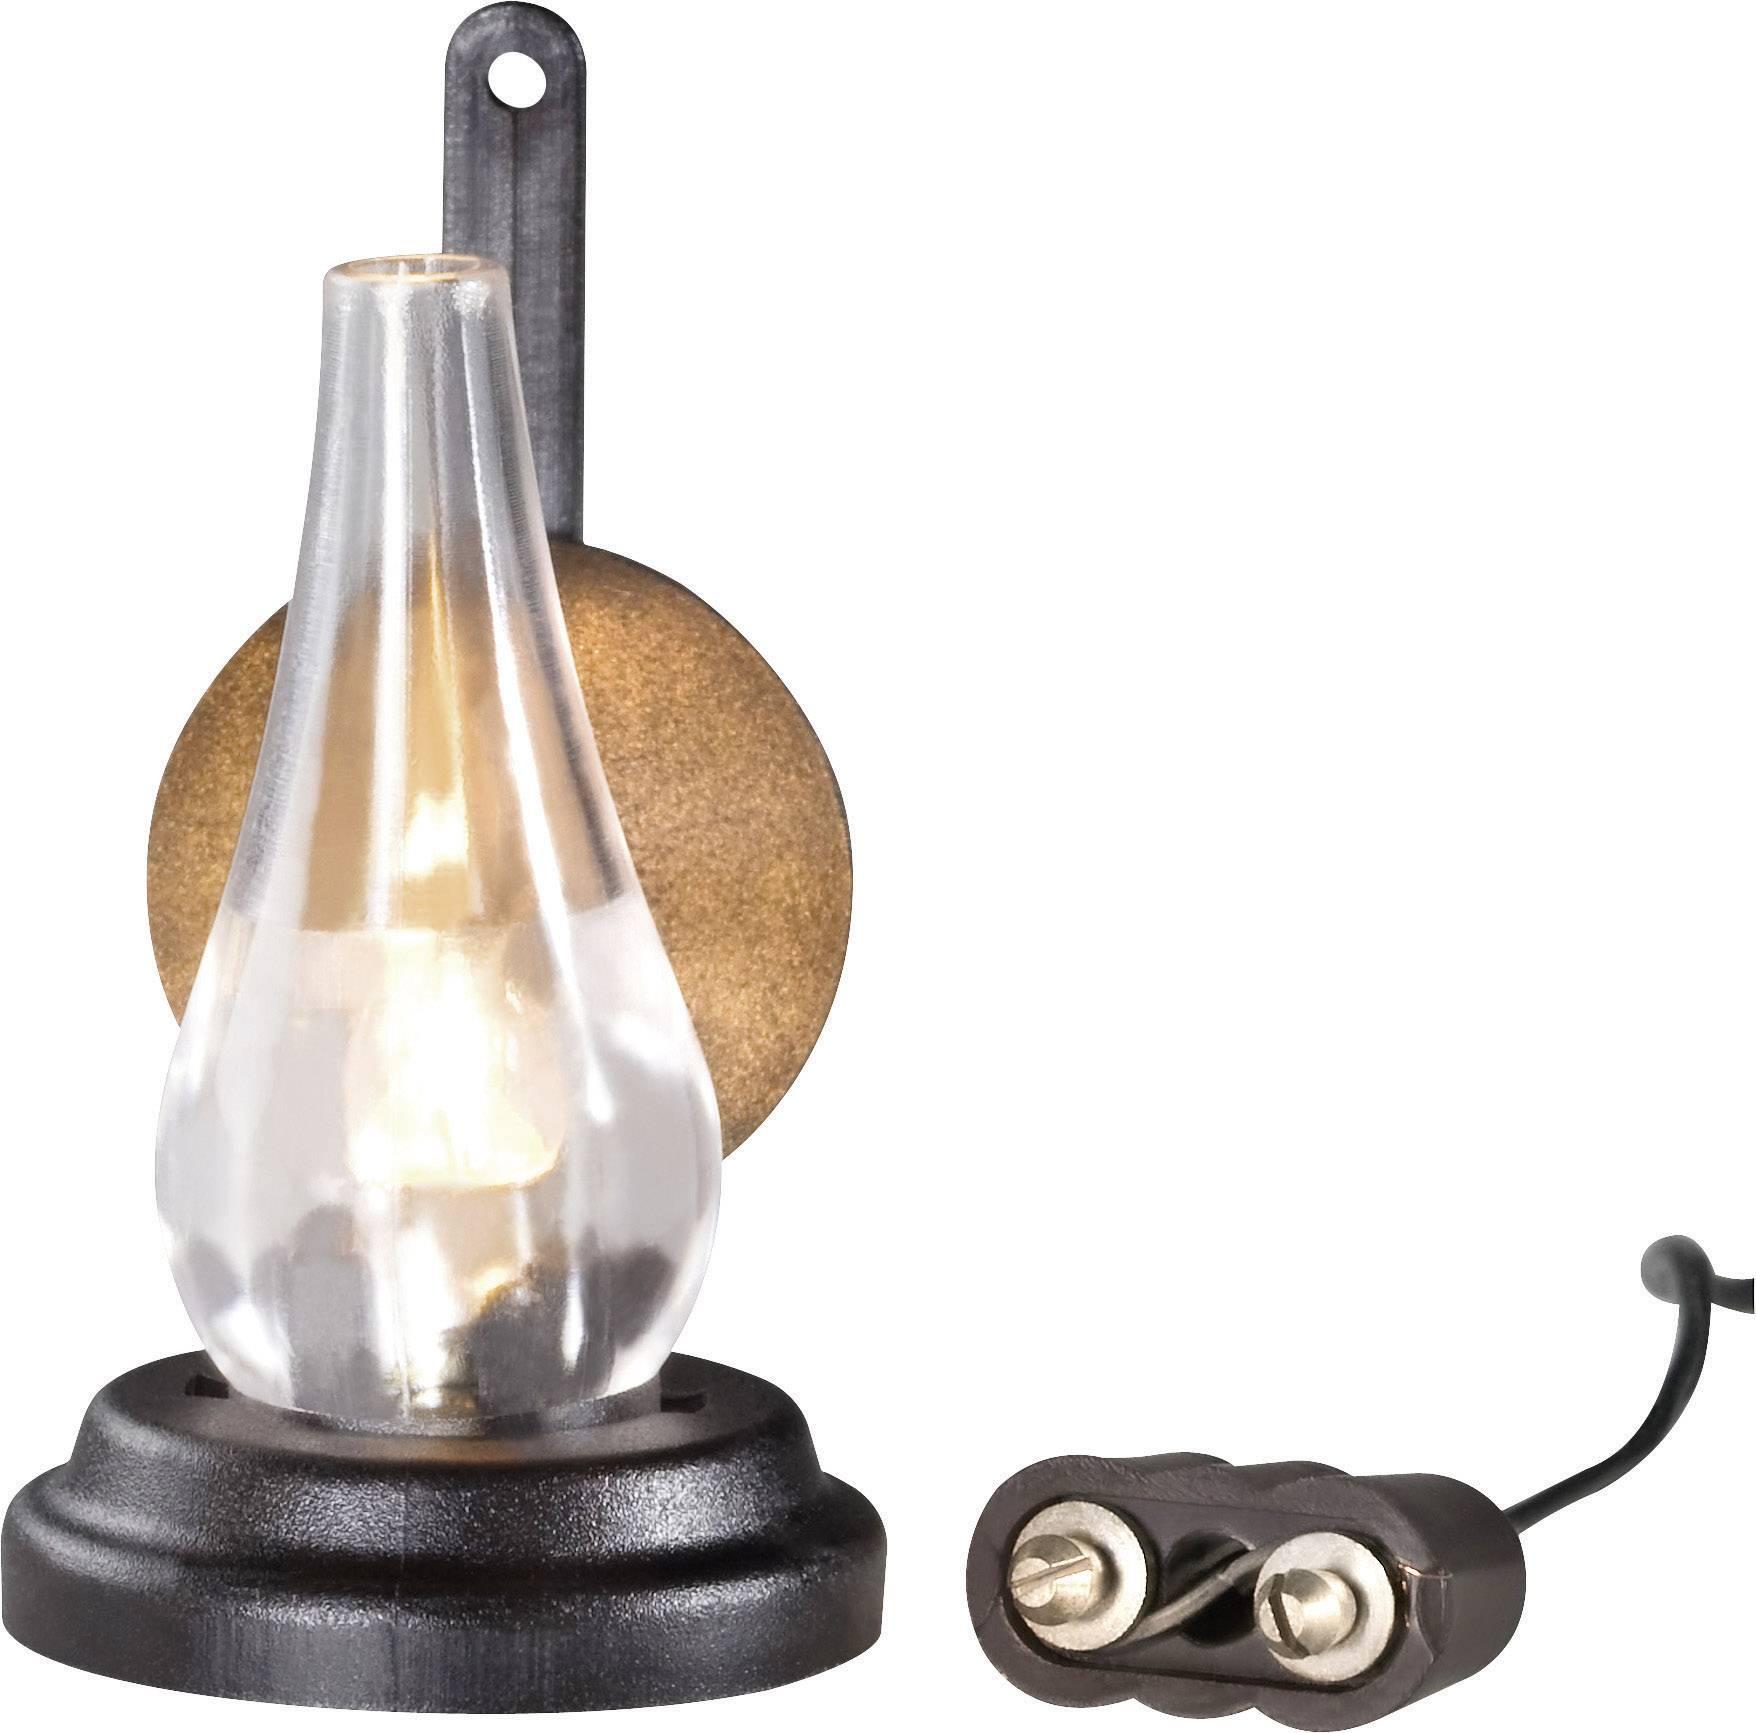 Kahlert Licht 20443 Petroleumlamp 3.5 V Met verlichting | Conrad.nl